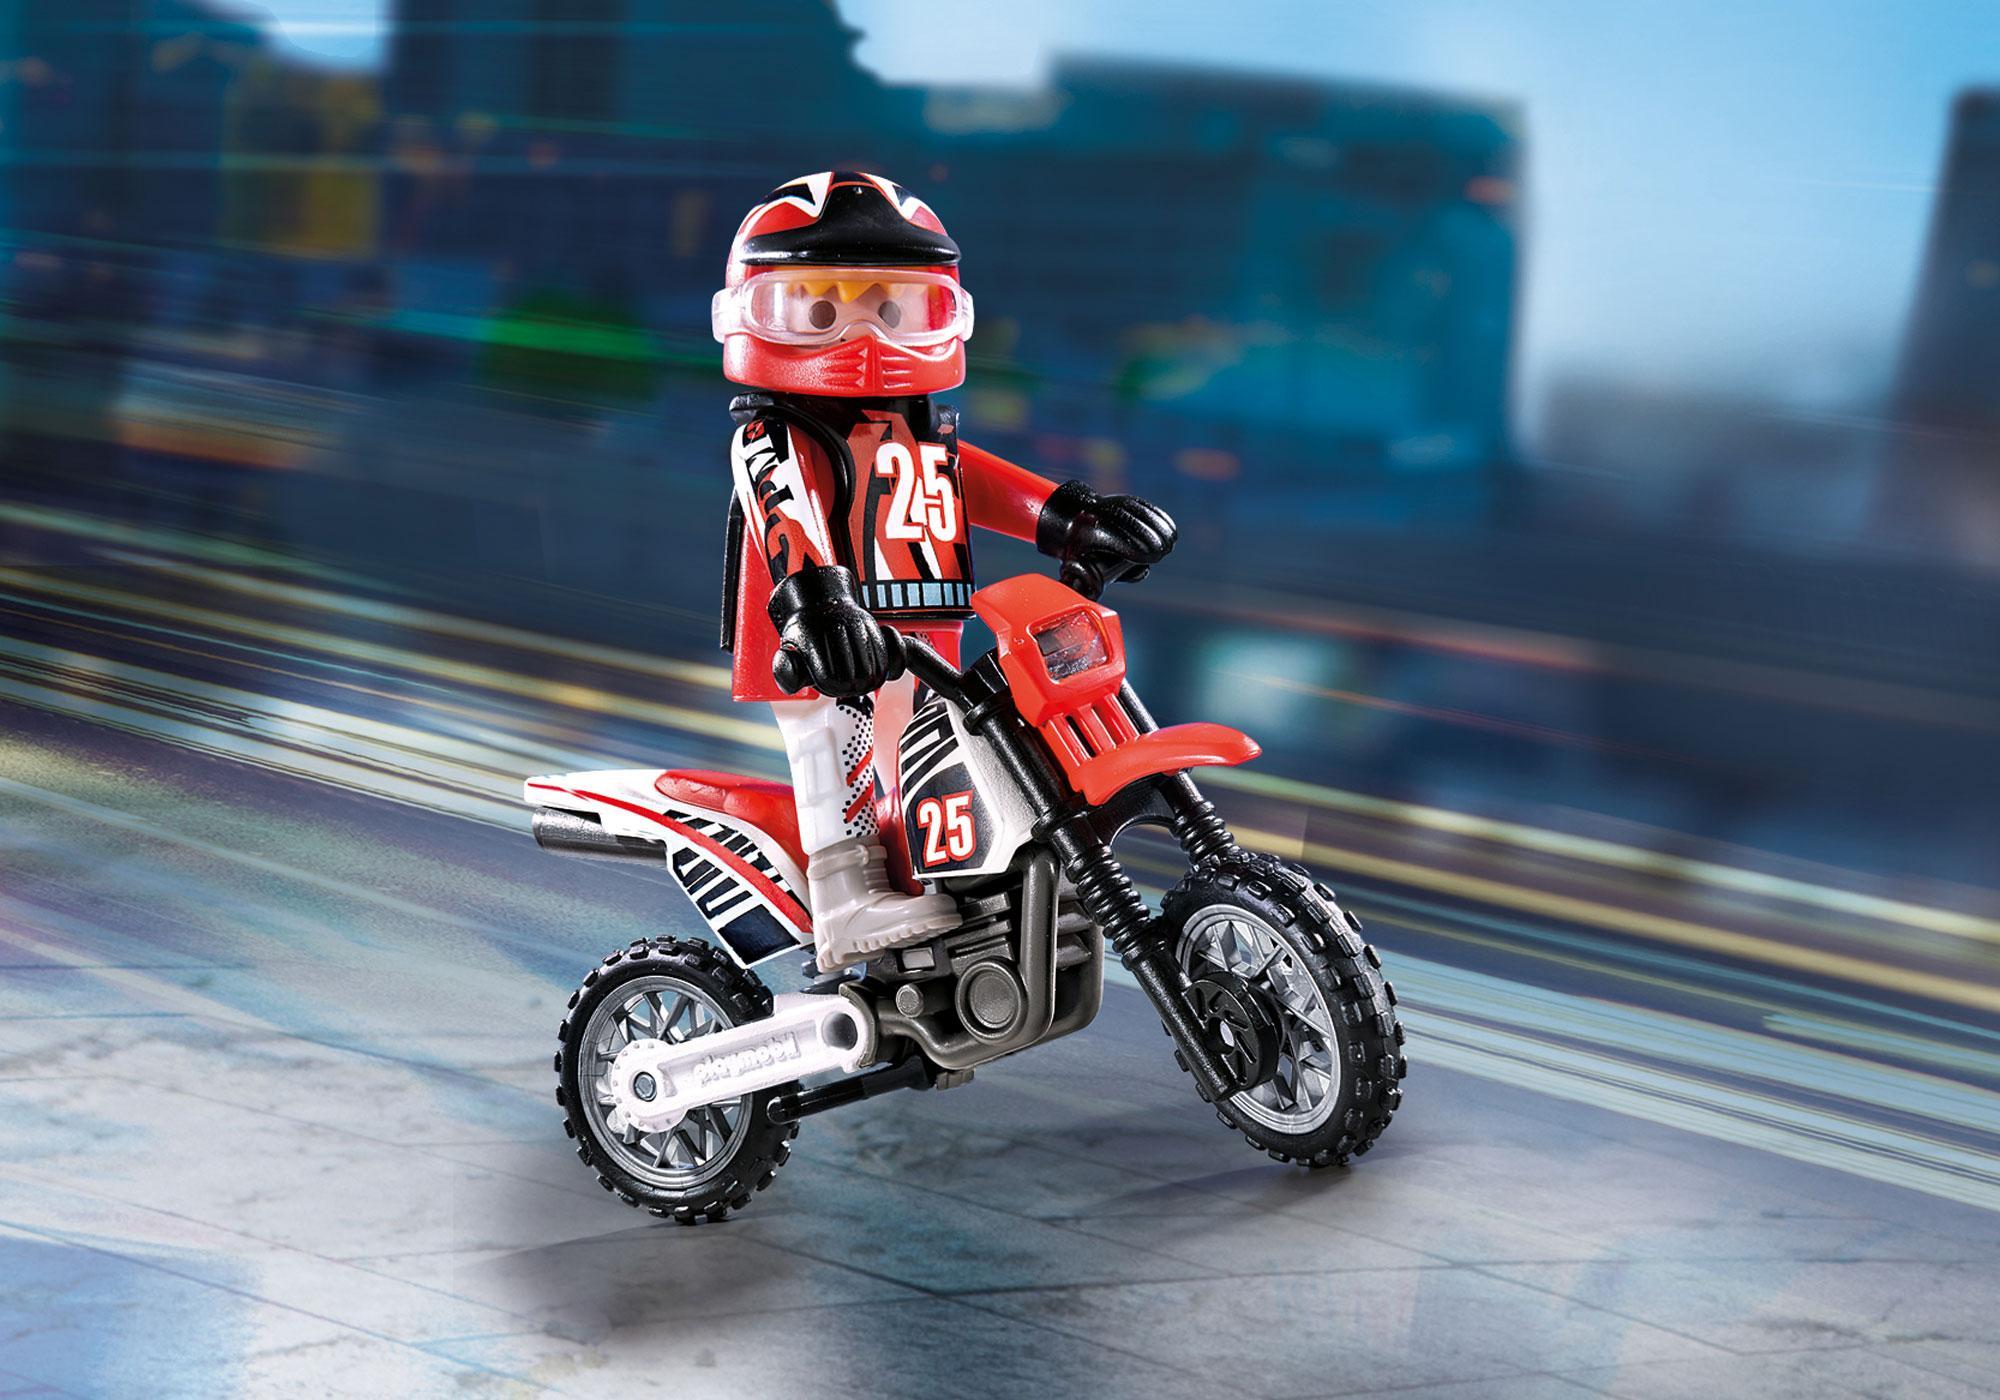 9357_product_detail/Motocrossförare